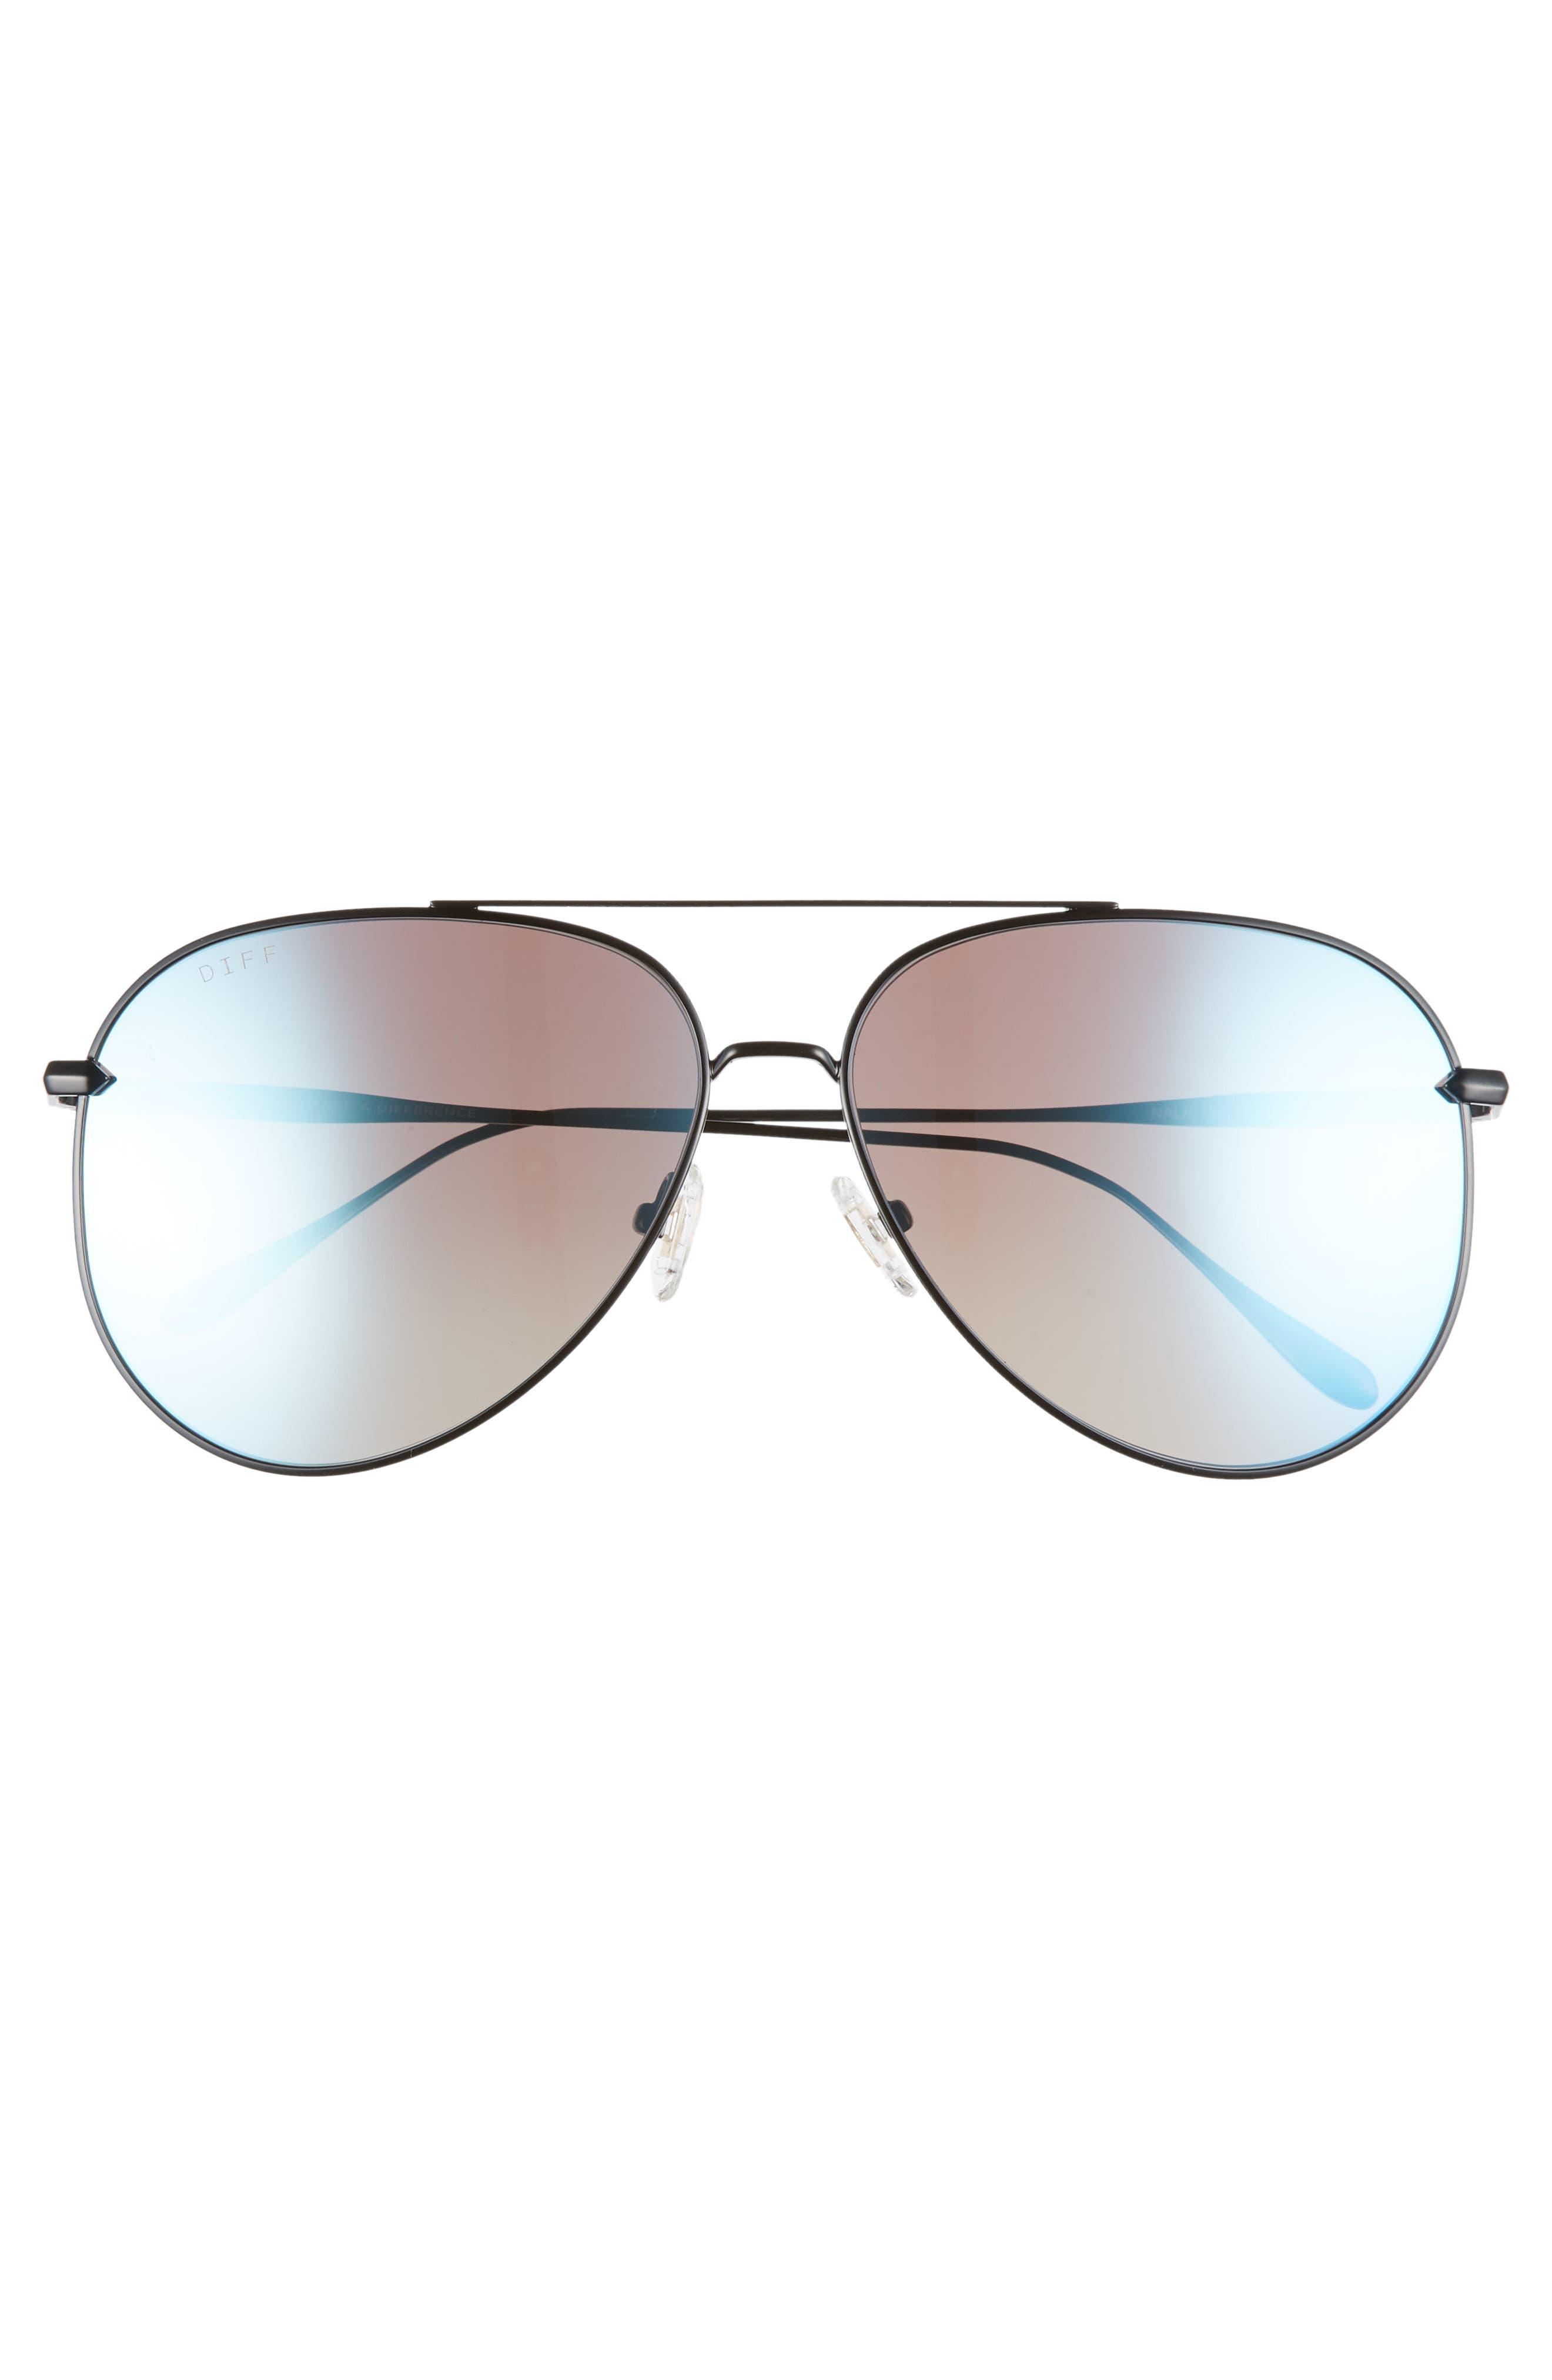 Nala 60mm Polarized Aviator Sunglasses,                             Alternate thumbnail 3, color,                             BLACK/ SMOKE